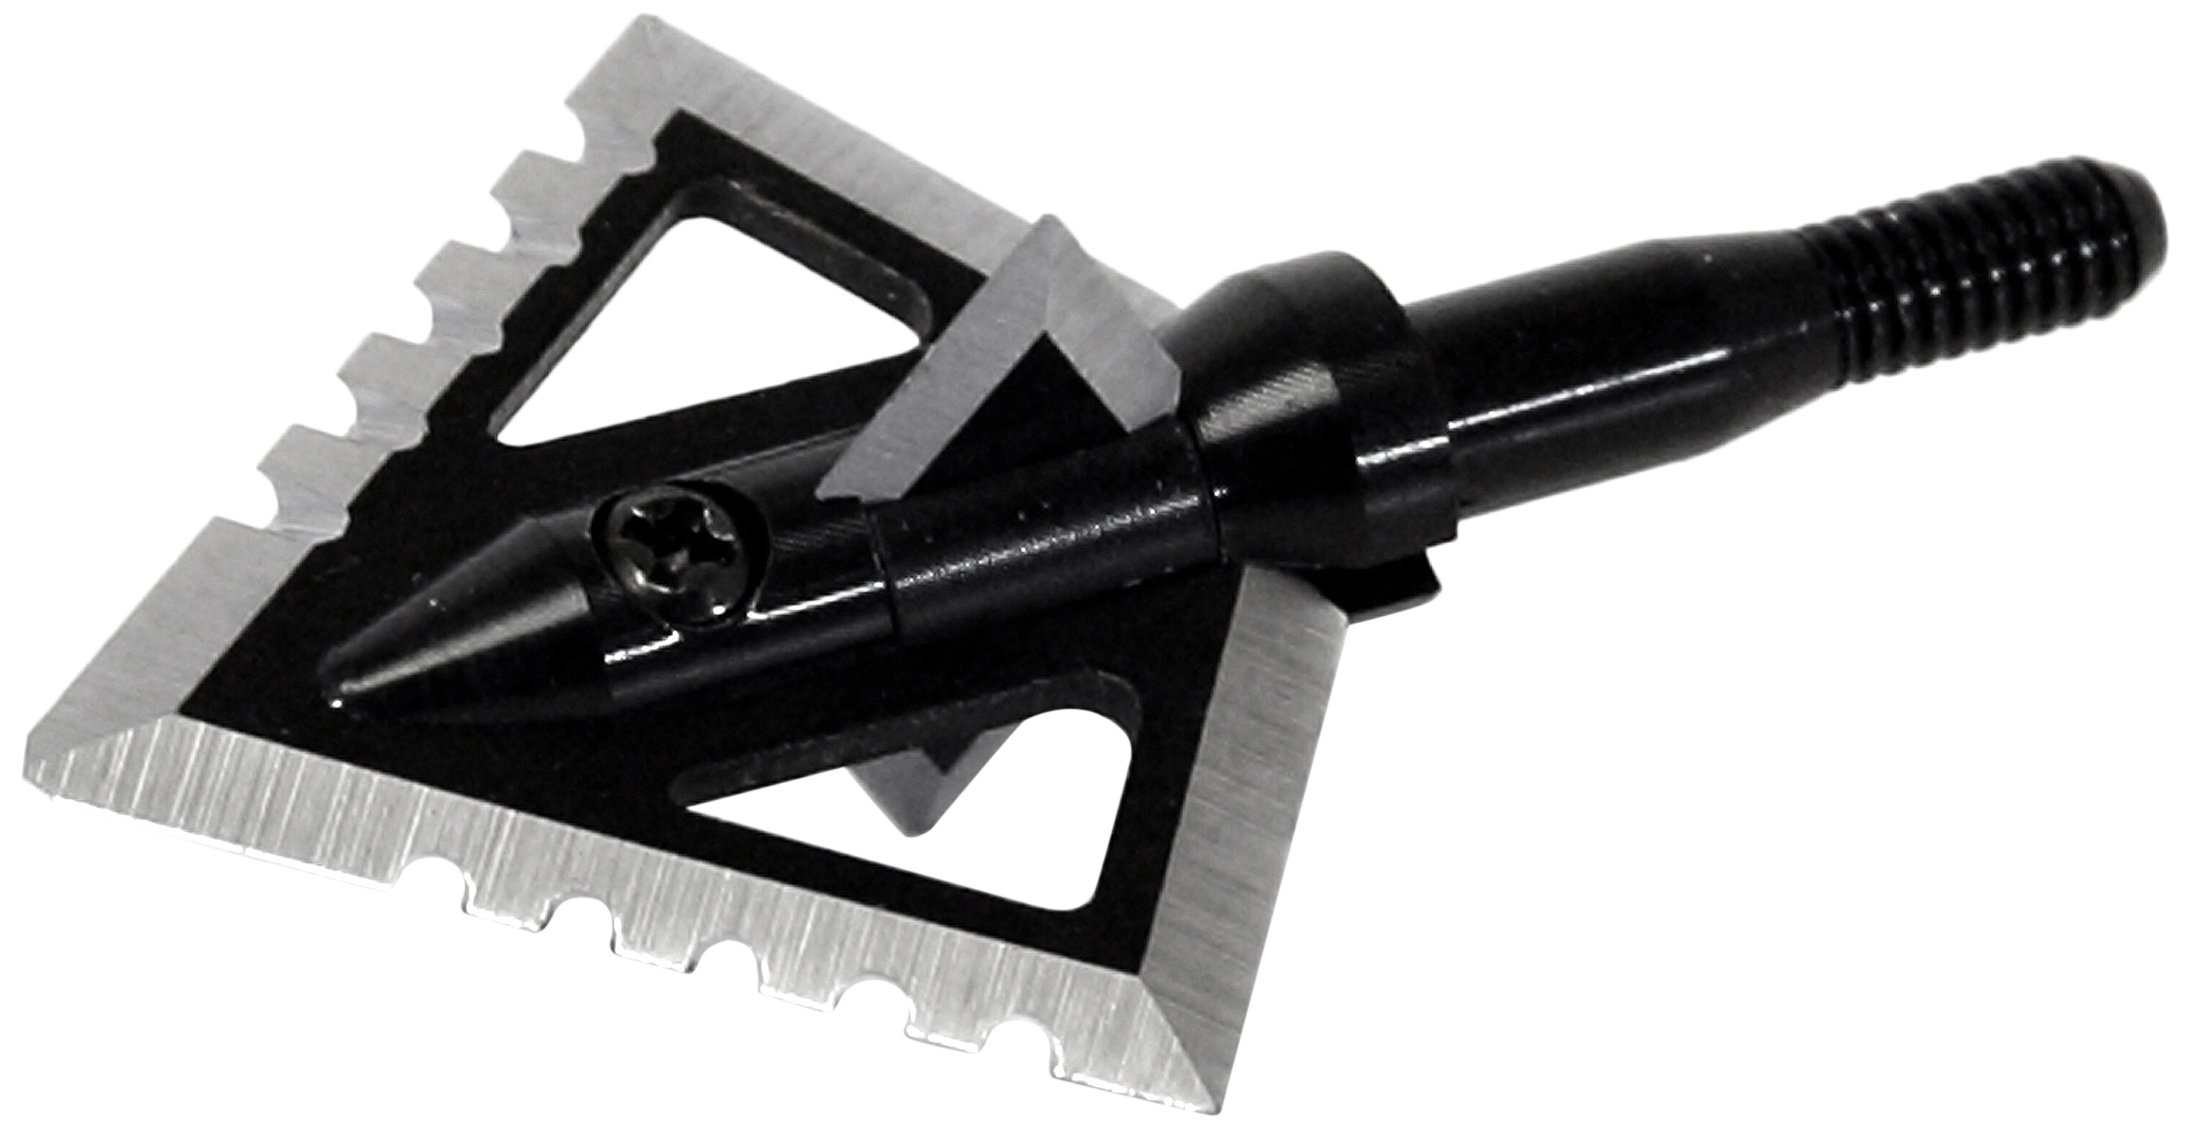 Magnus 4 Blade Hornet Ser-Razor Broadhead (3-Pack), Black, 100-Grain by Magnus